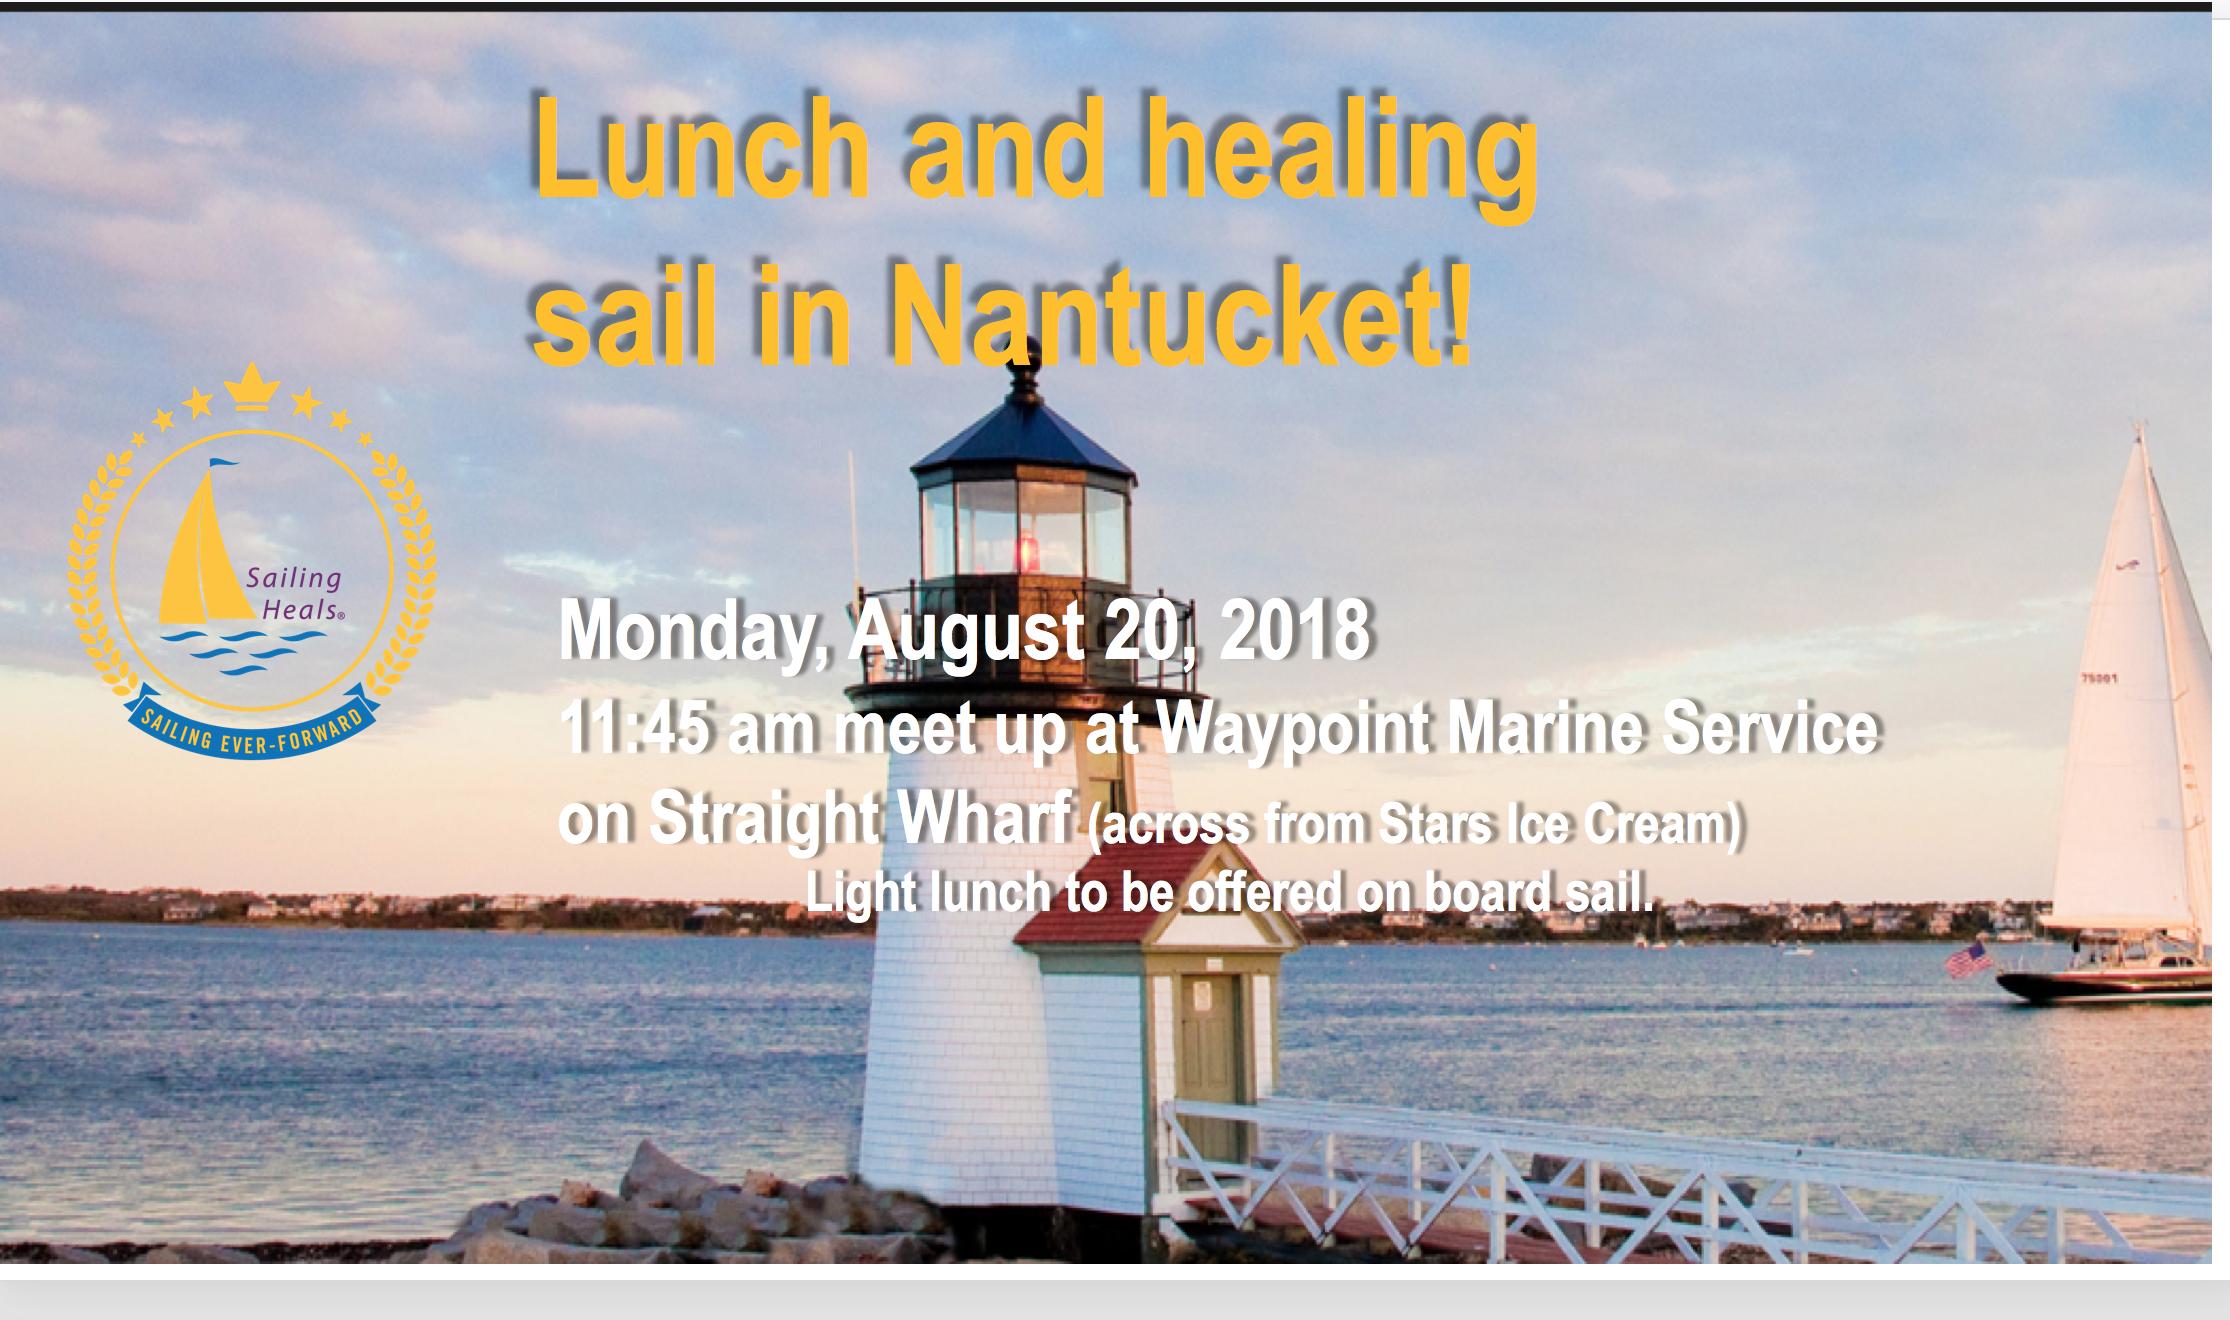 8/20/18 Nantucket lunch and healing sail